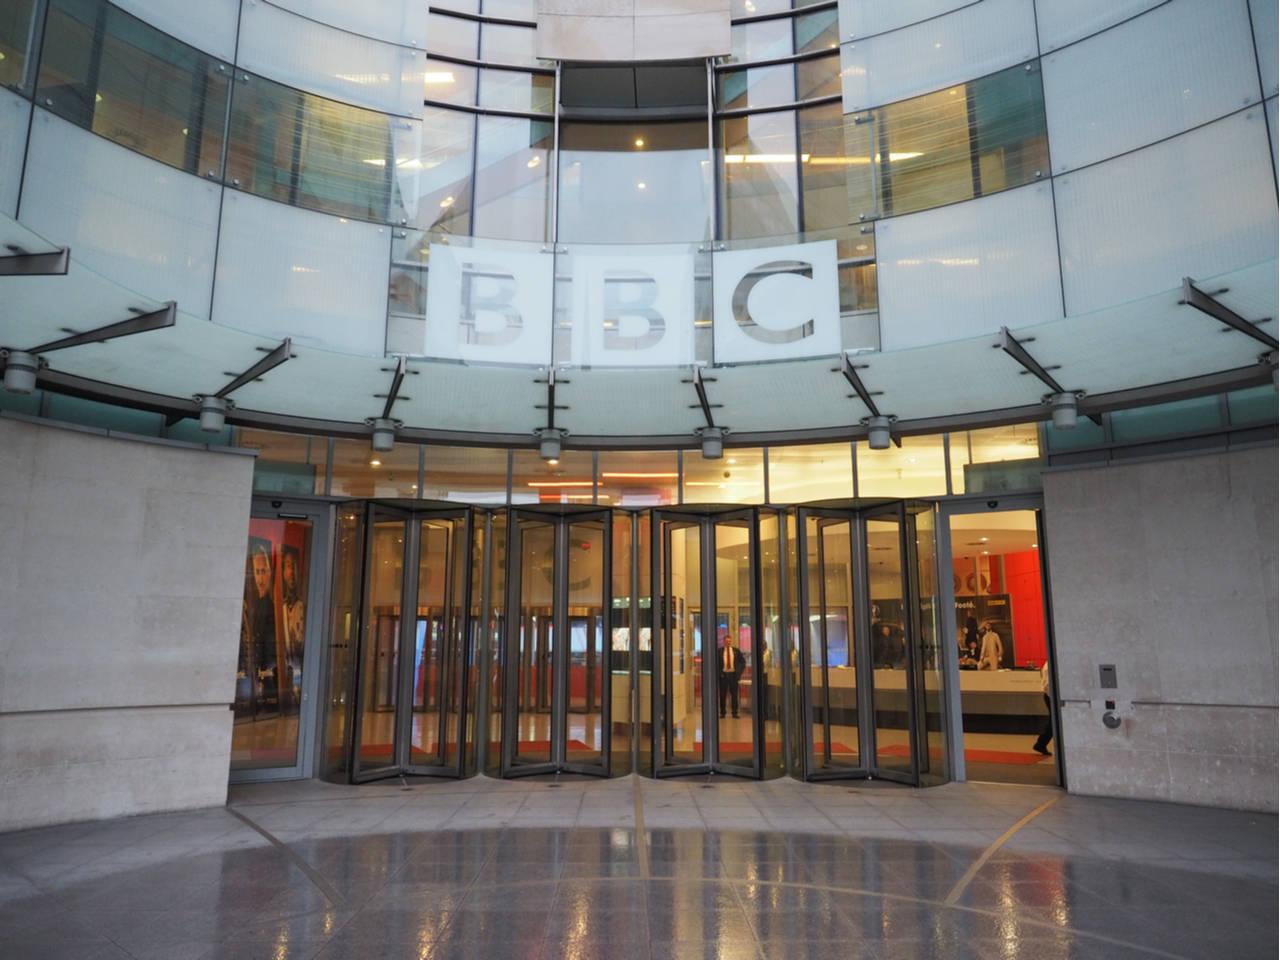 BBC Studios image by Claudio Divizia (via Shutterstock).